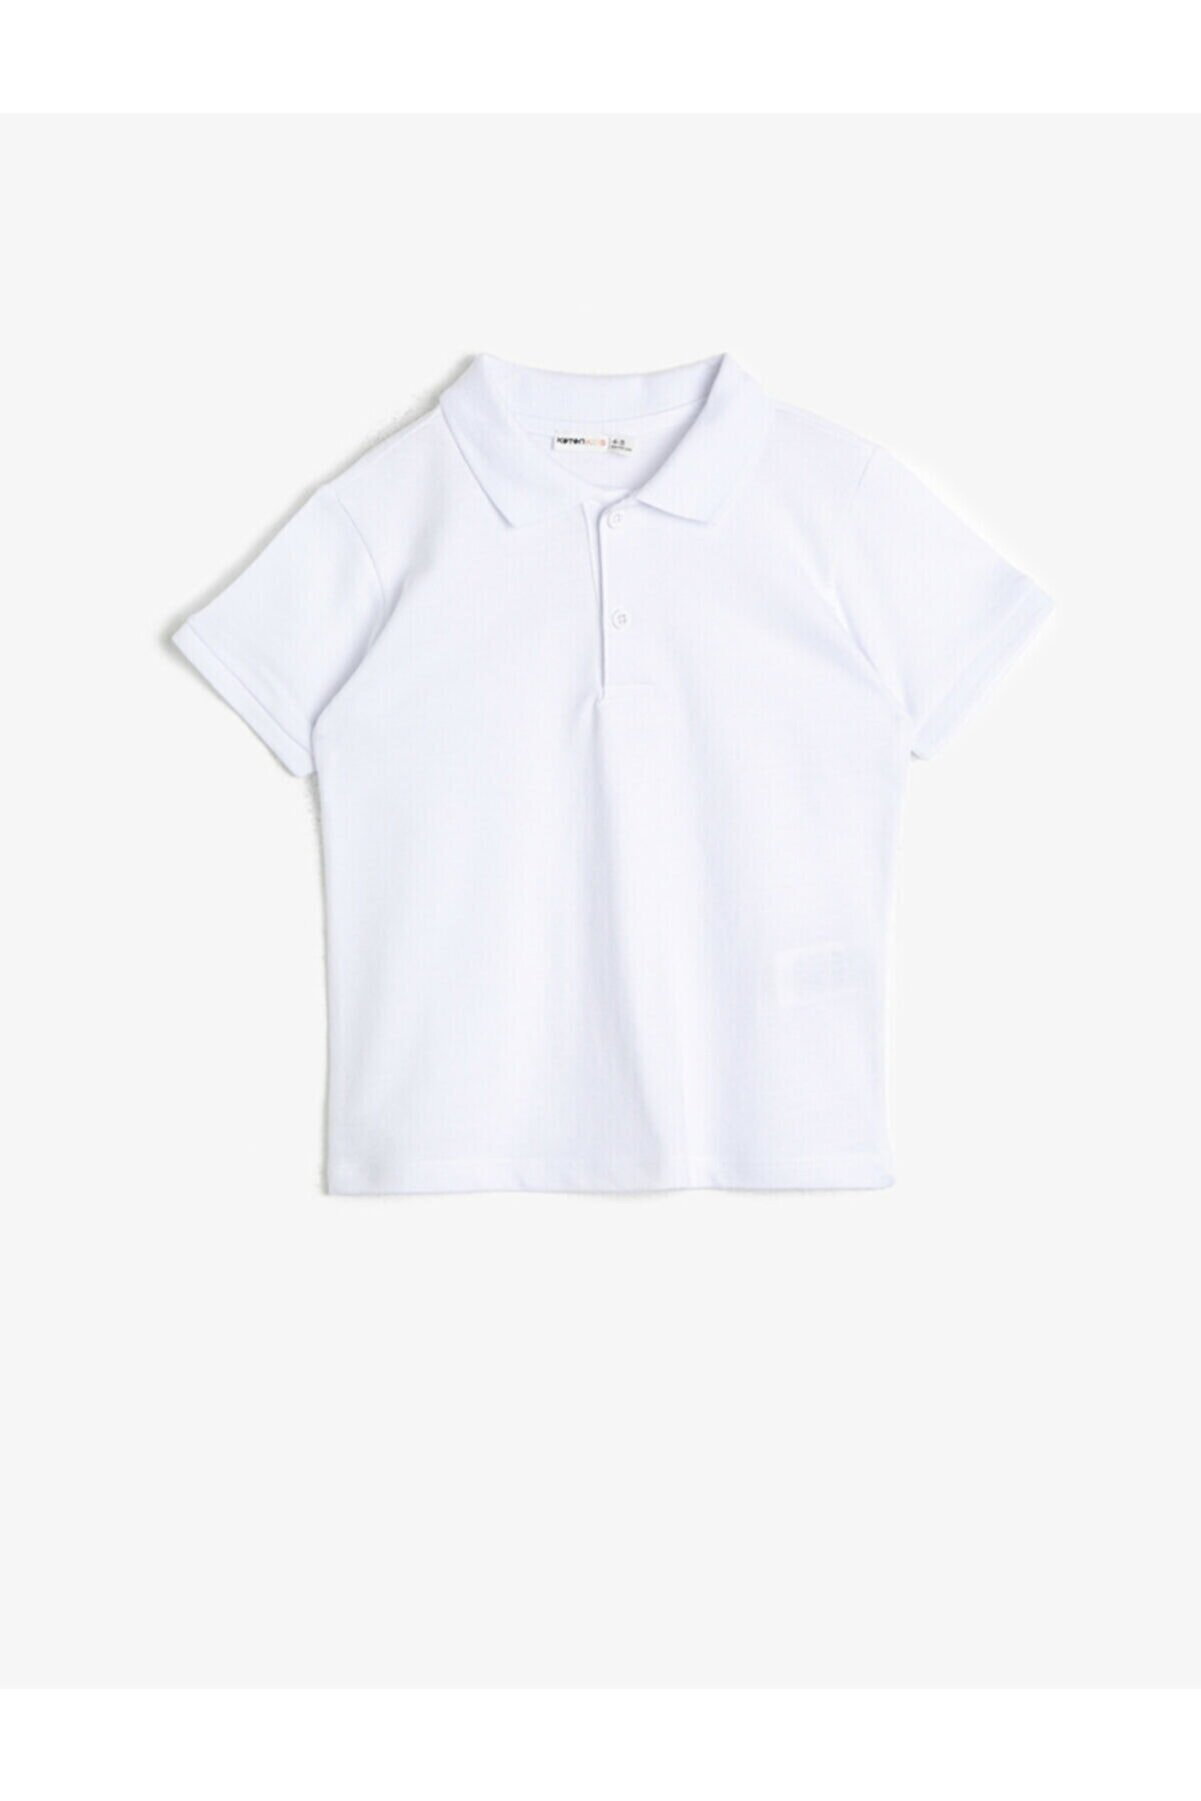 Koton Erkek Çocuk Basic Pamuklu Kol Ucu Triko Detayli Polo Pike Tisört